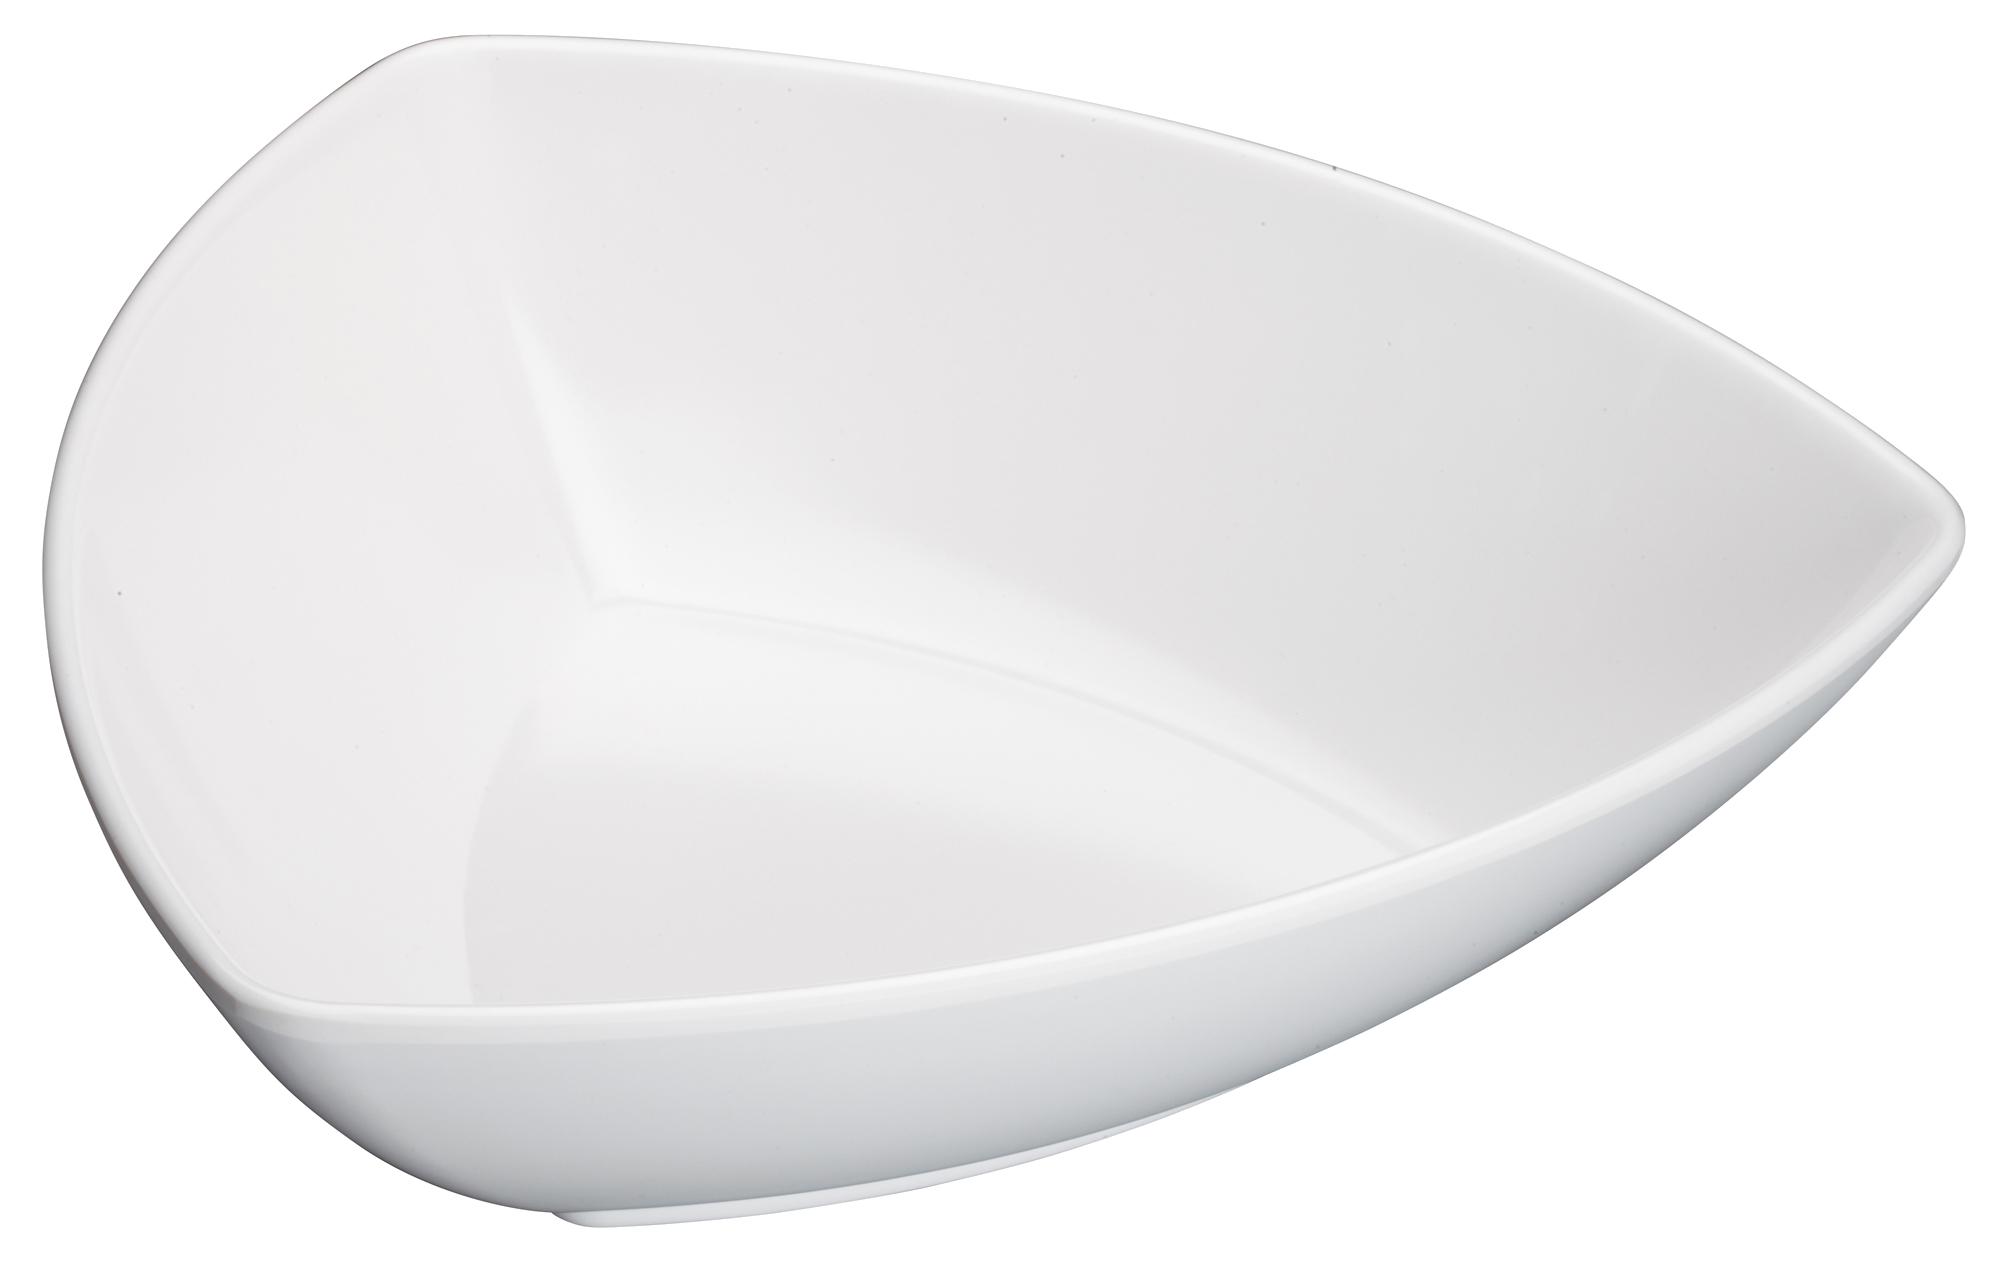 Winco WDM005-204 bowl, plastic,  1 - 2 qt (32 - 95 oz)